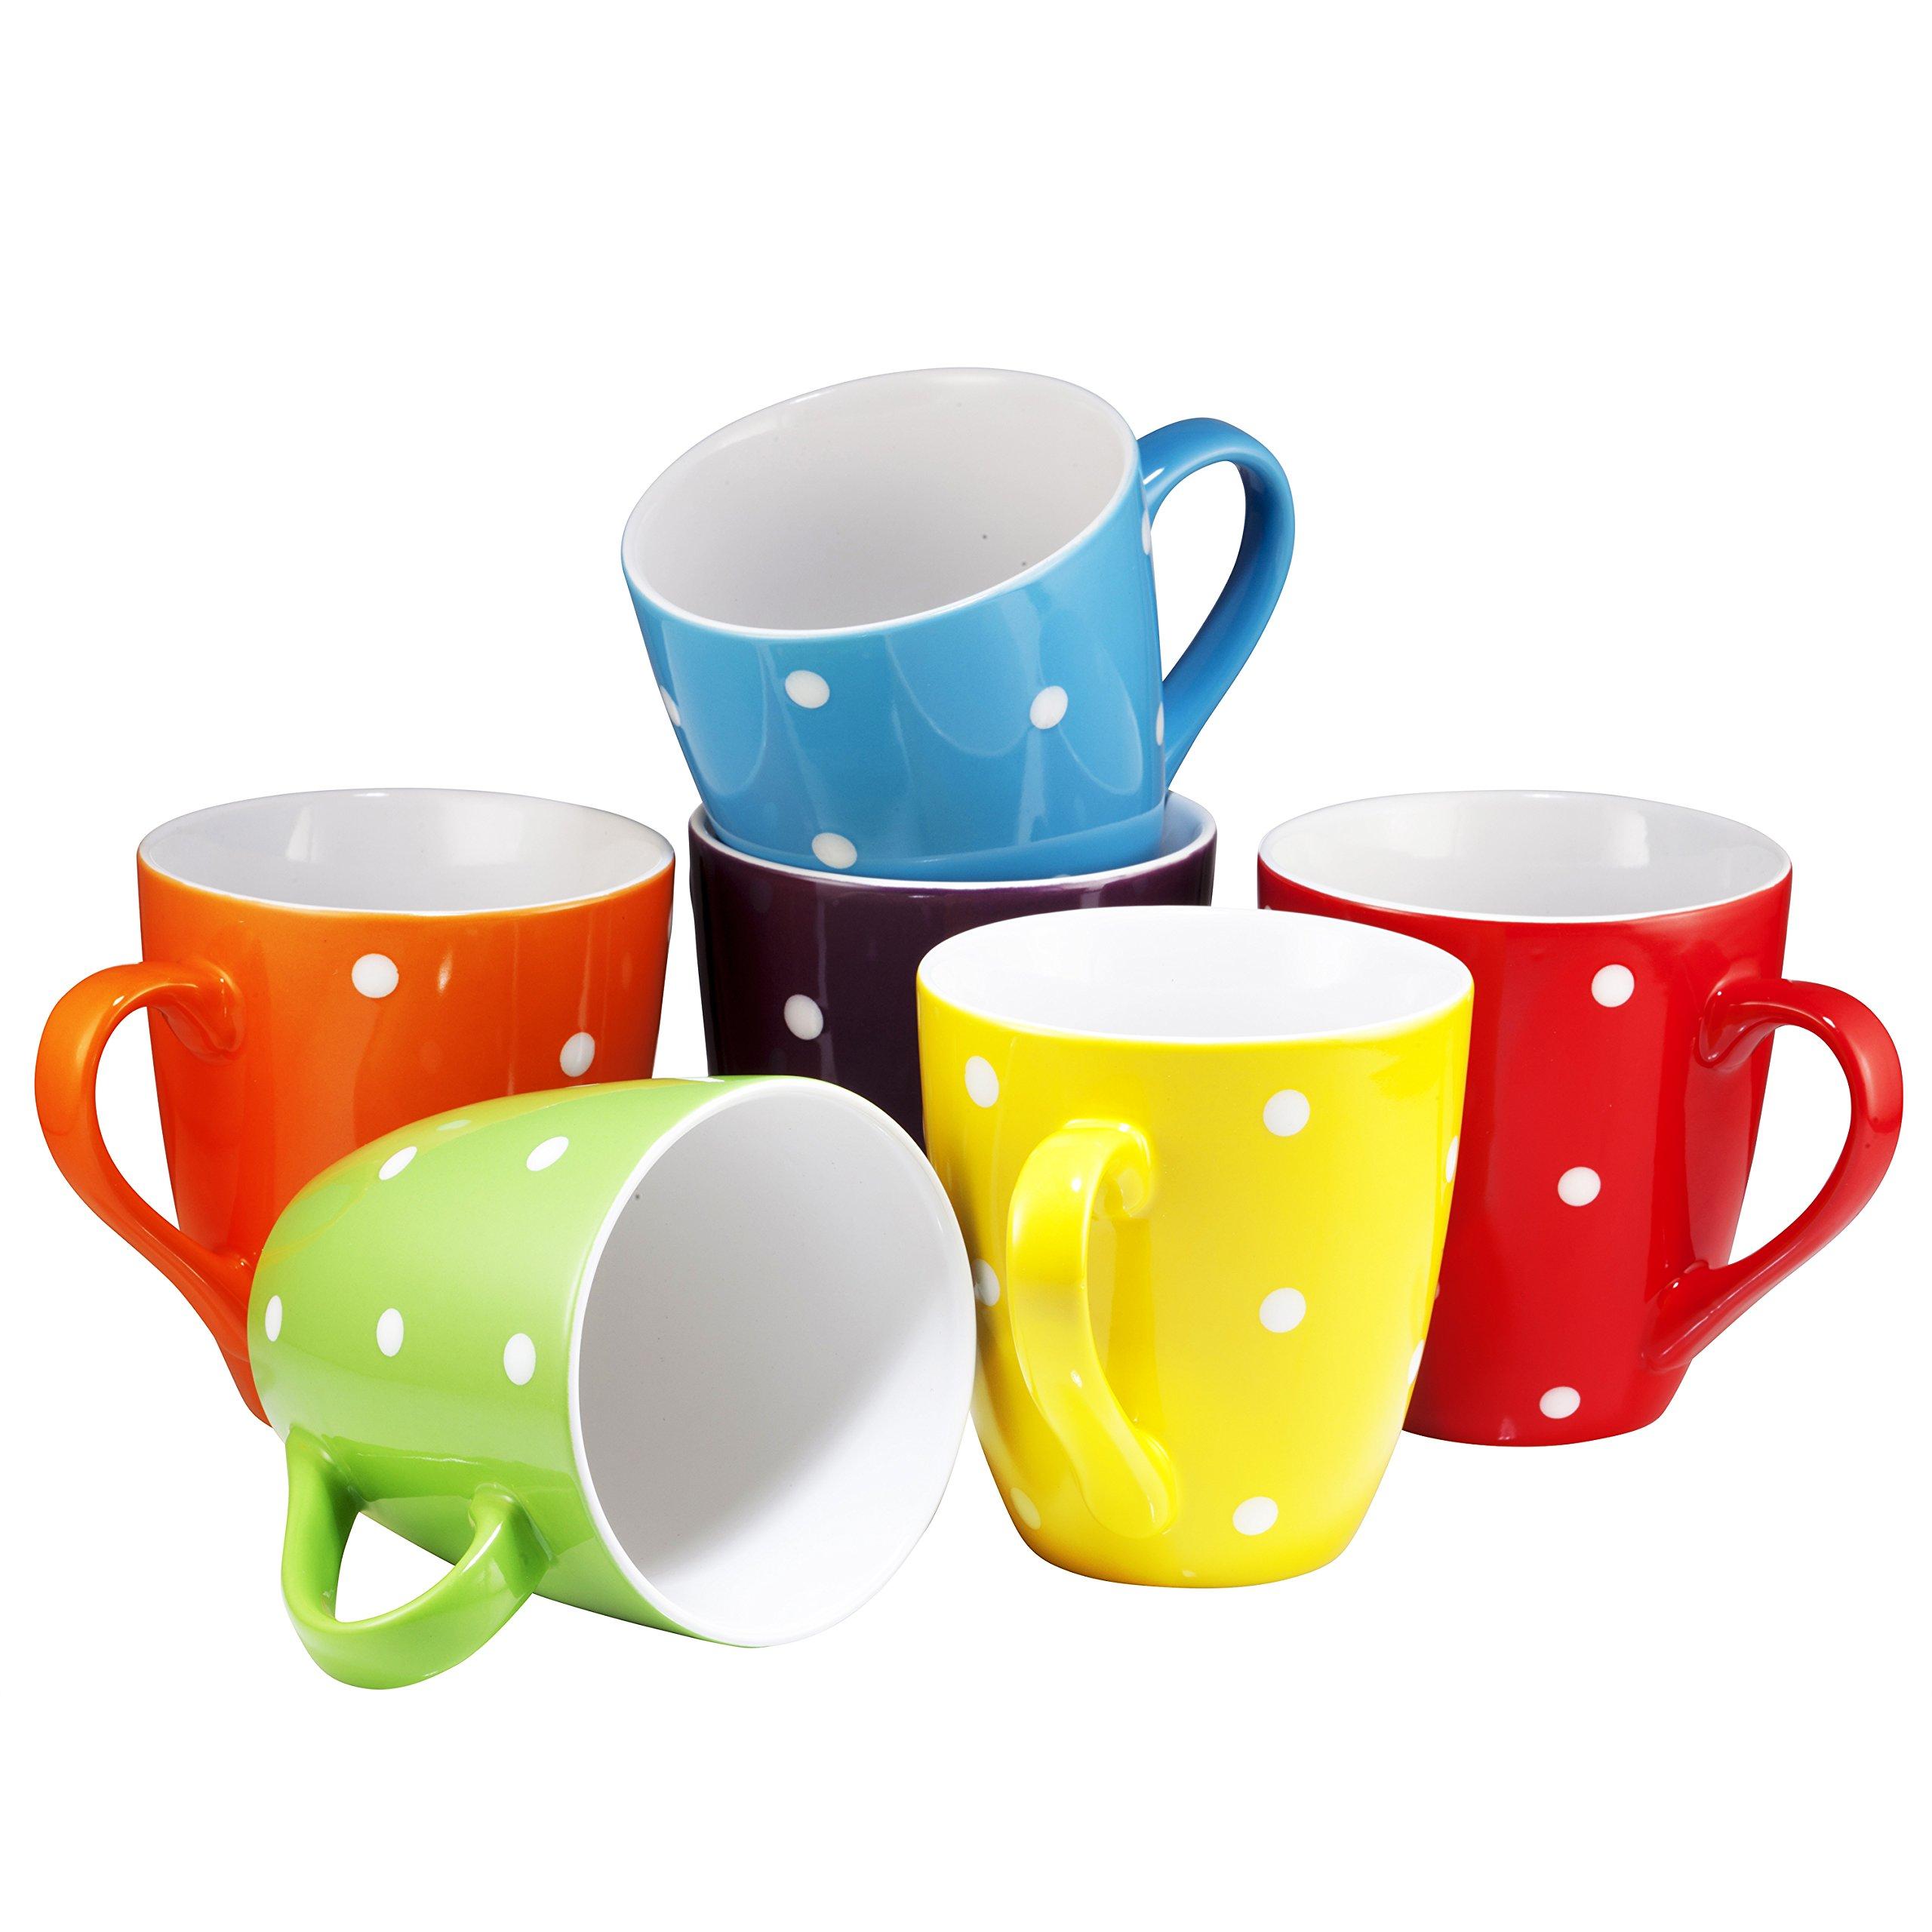 Coffee Mug Set Set of 6 Large-sized 16 Ounce Ceramic Coffee Mugs Restaurant Coffee Mugs By Bruntmor (Polka Dot) by Bruntmor (Image #1)